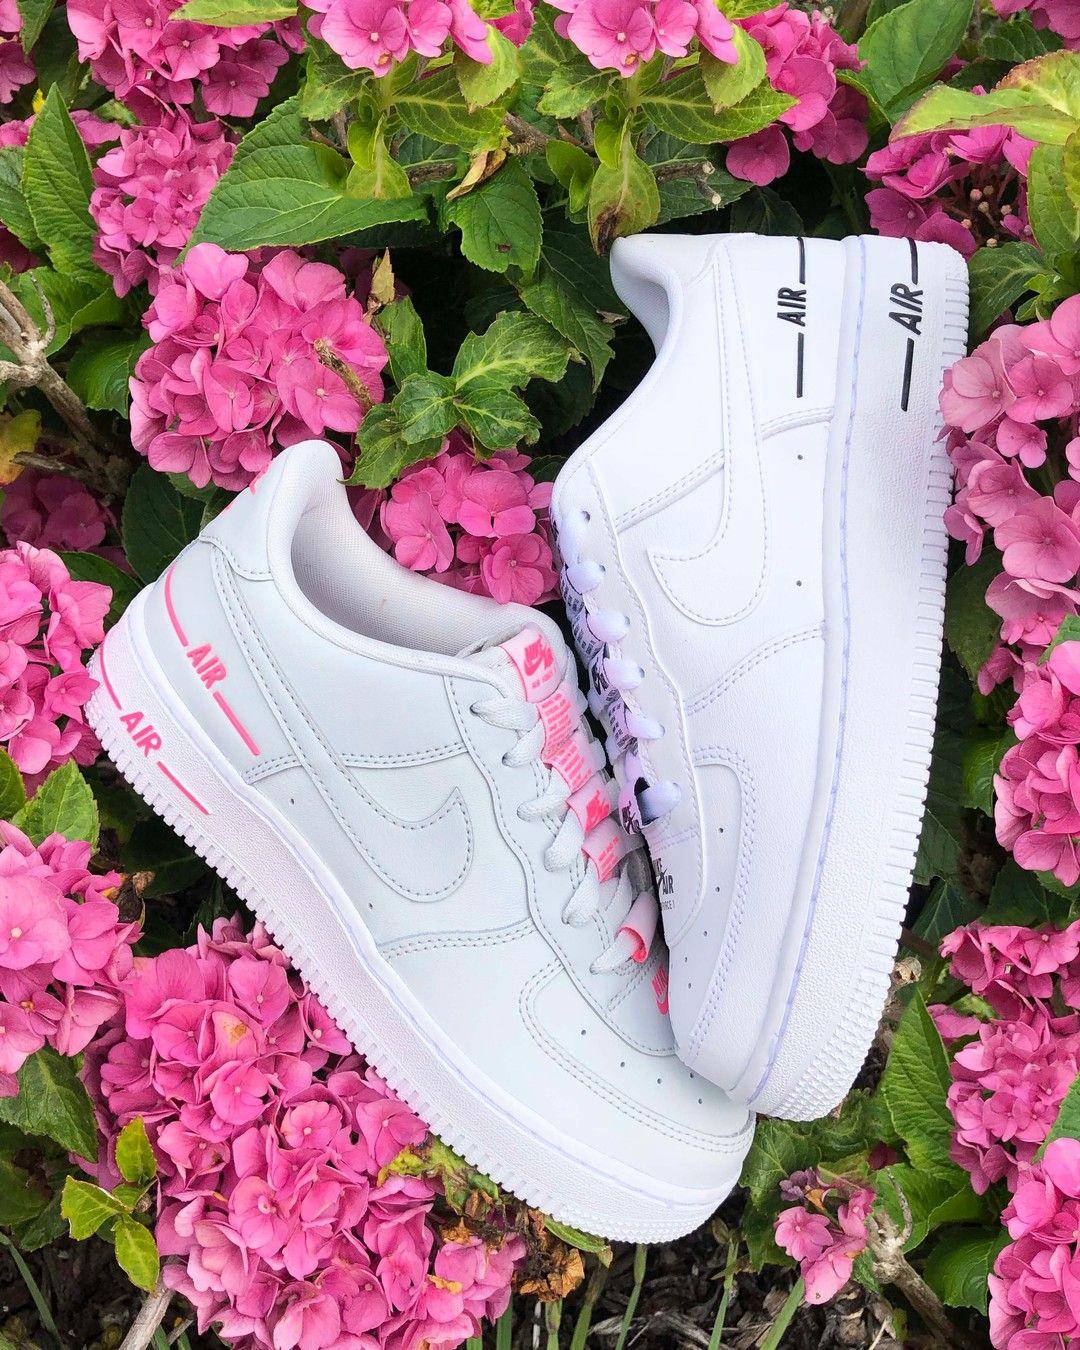 Get Free Shoes Giveaway 2020 JPG